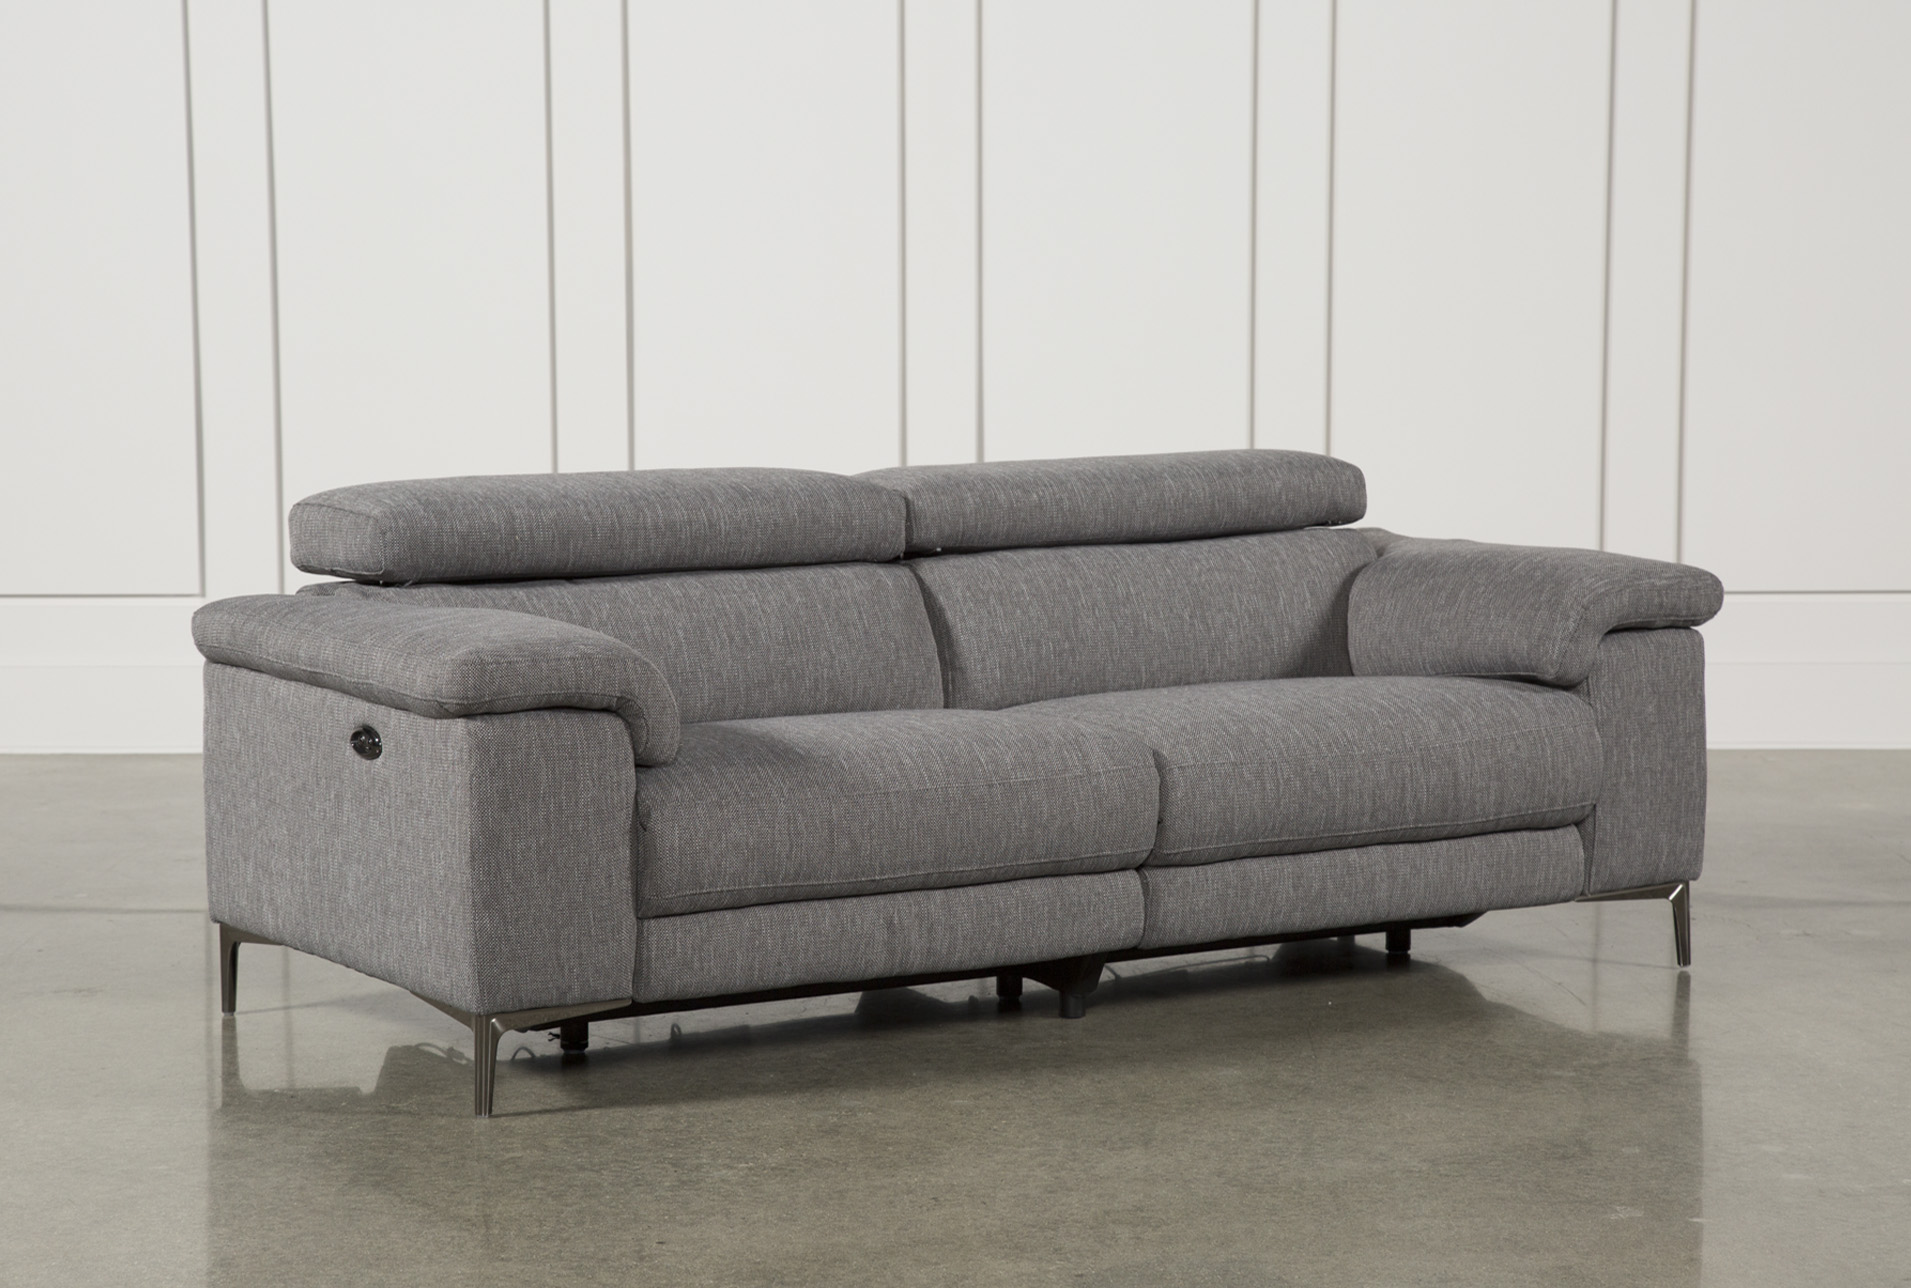 talin grey power reclining sofa w usb living spaces rh livingspaces com power reclining sofas and loveseats power reclining sofas near me